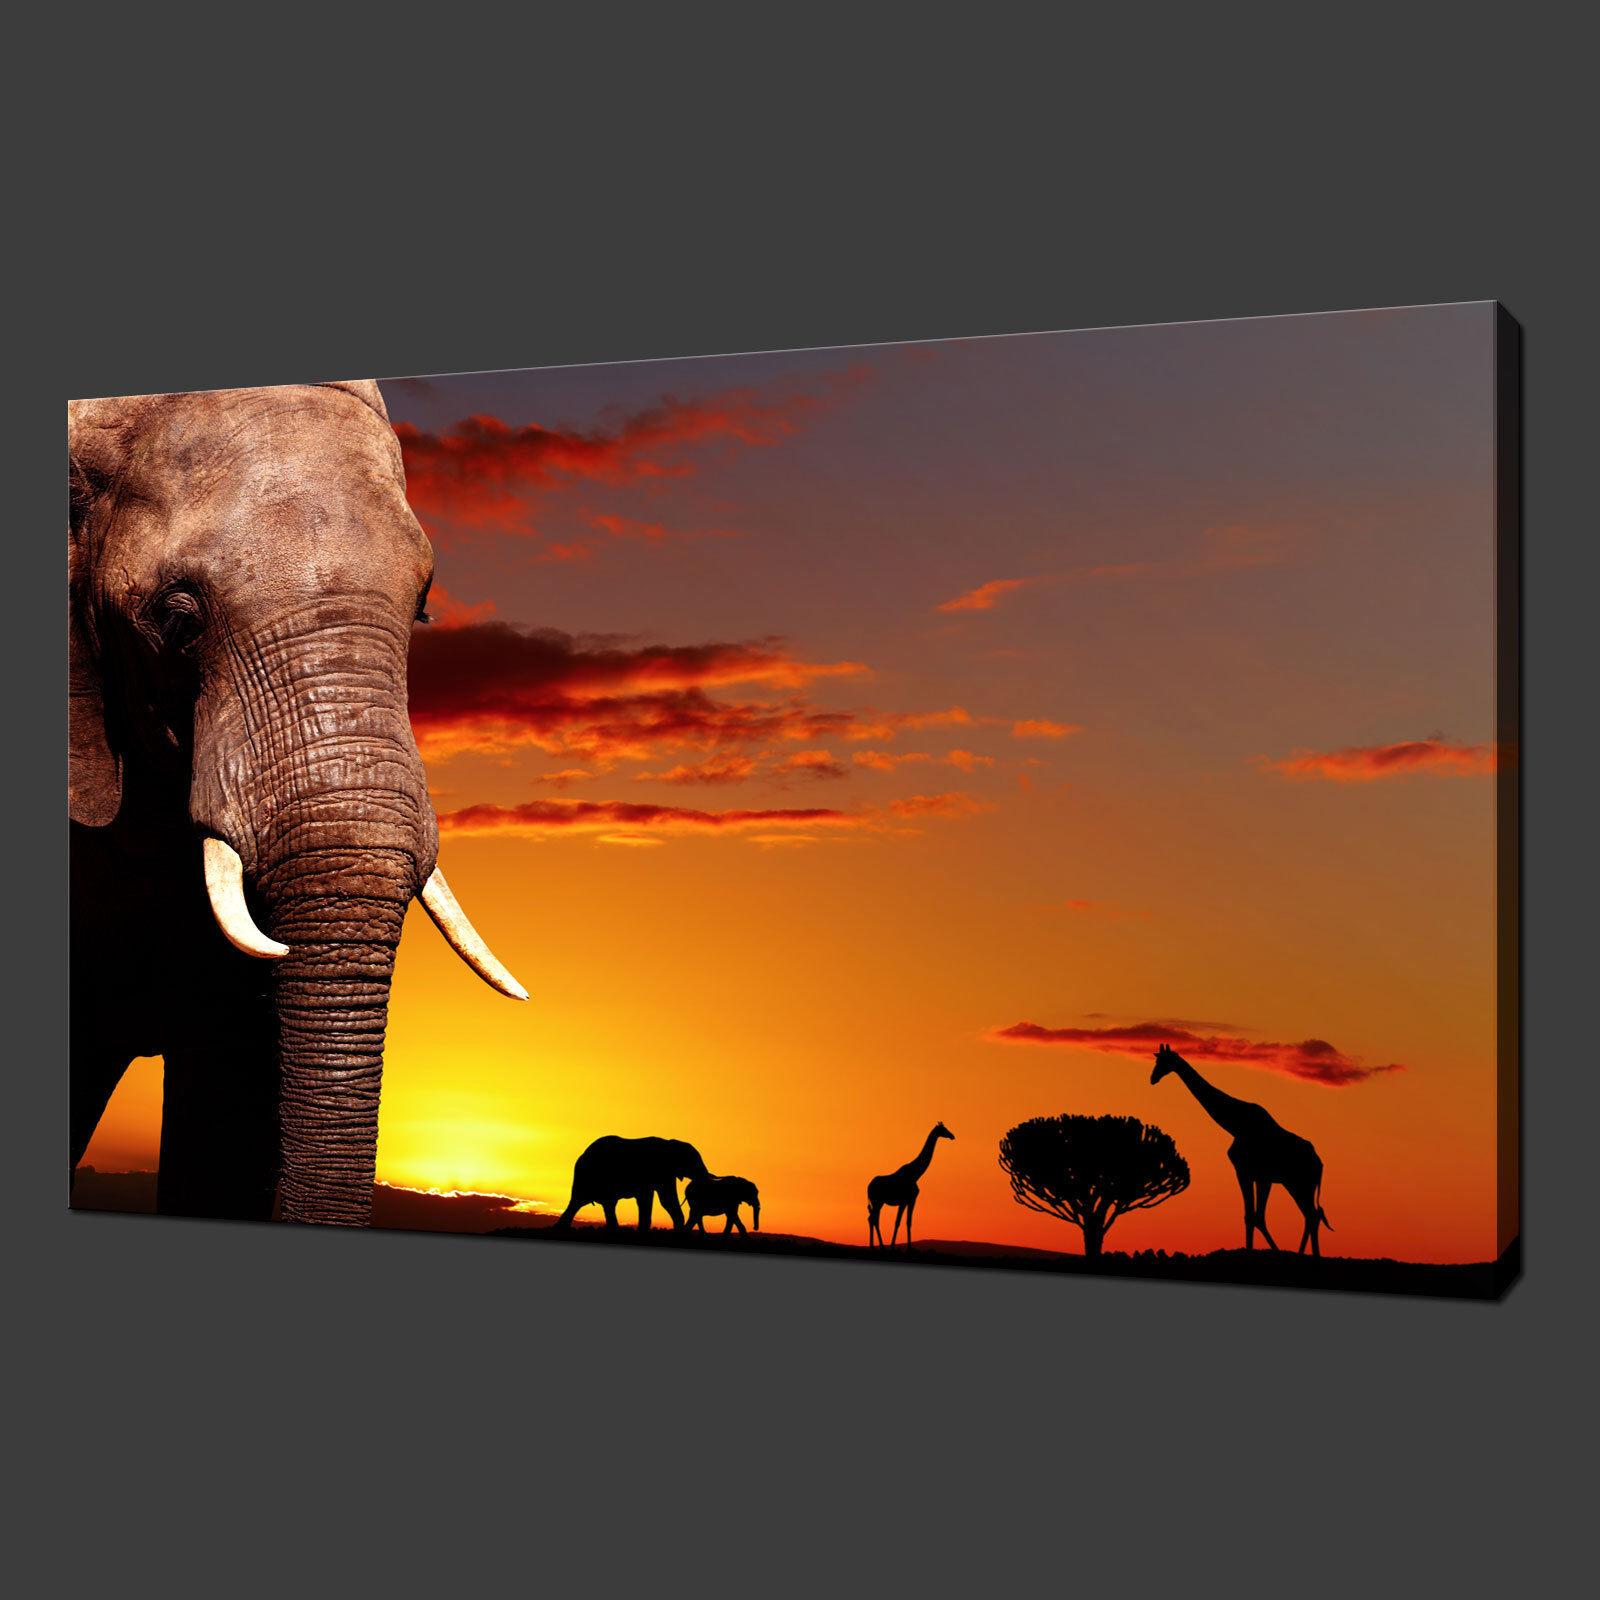 BELLISSIMO tramonto africano Animali Deserto Scatola Tela Stampa Wall Art Picture